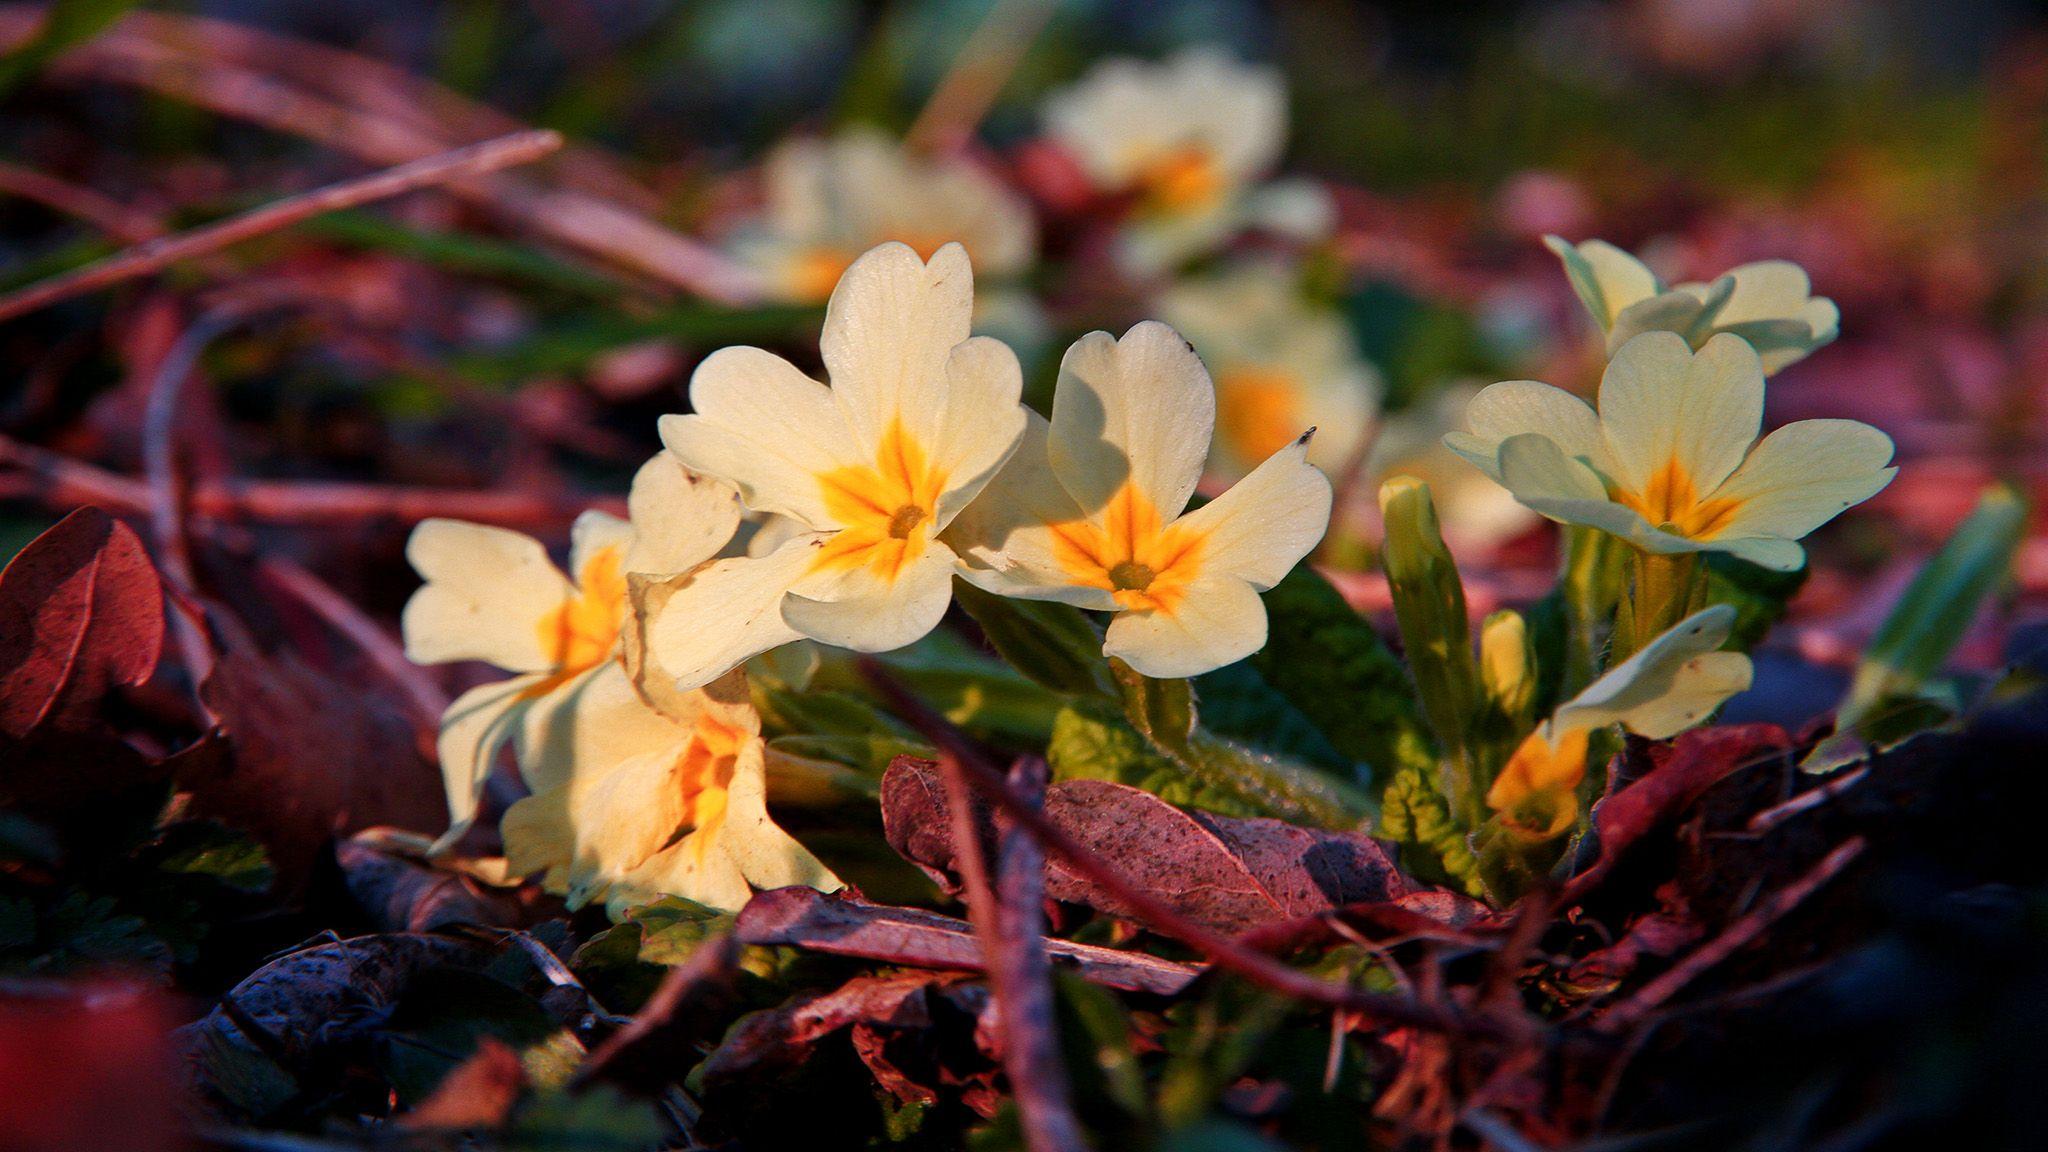 Happy Spring Equinox :-D  Buon Equinozio di Primavera :-)